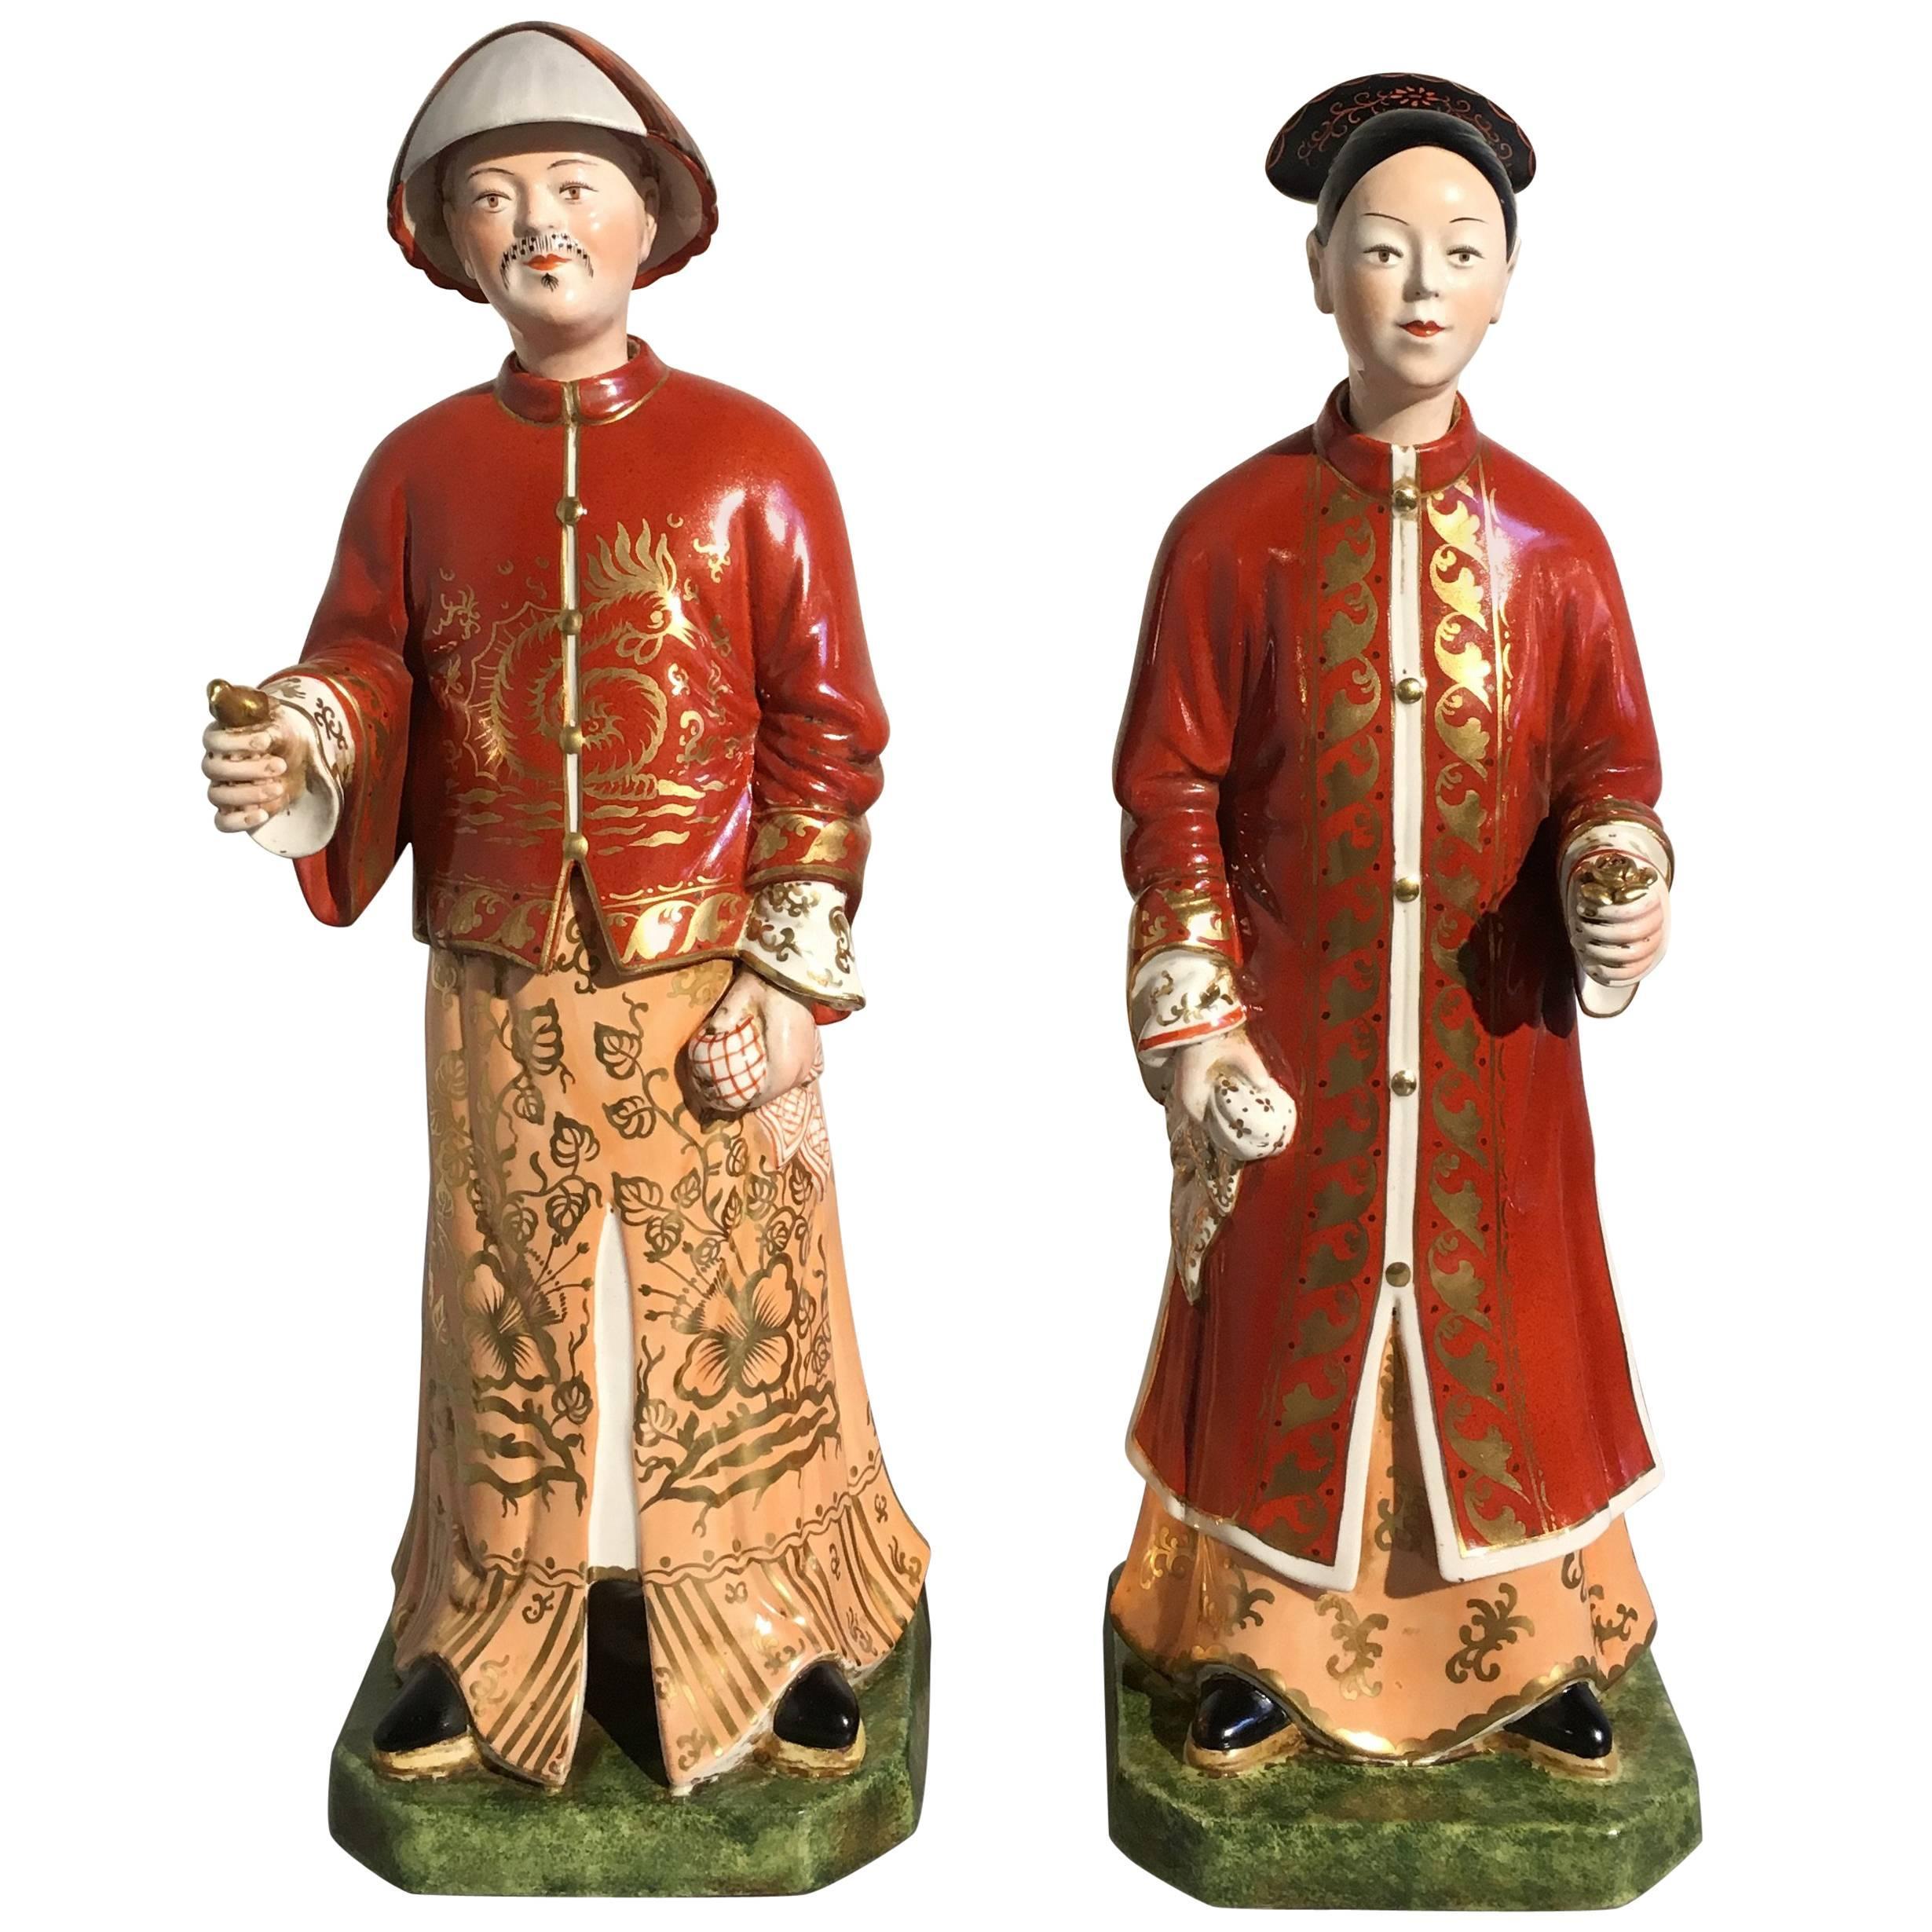 Pair of 20th Century Italian Chinoiserie Porcelain Nodding Head Figures